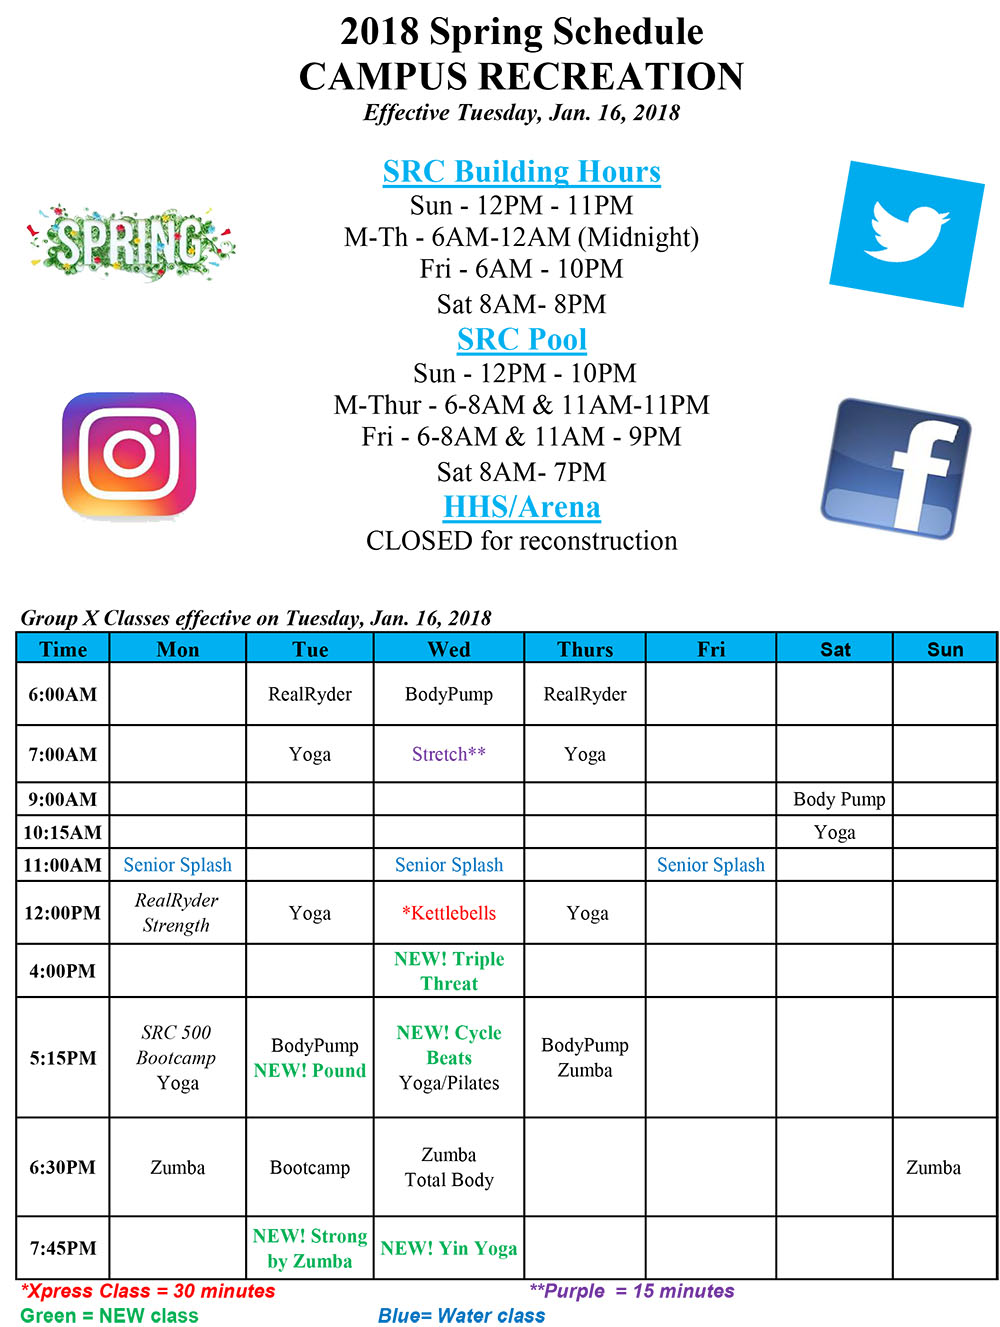 Spring 2018 Building Schedule